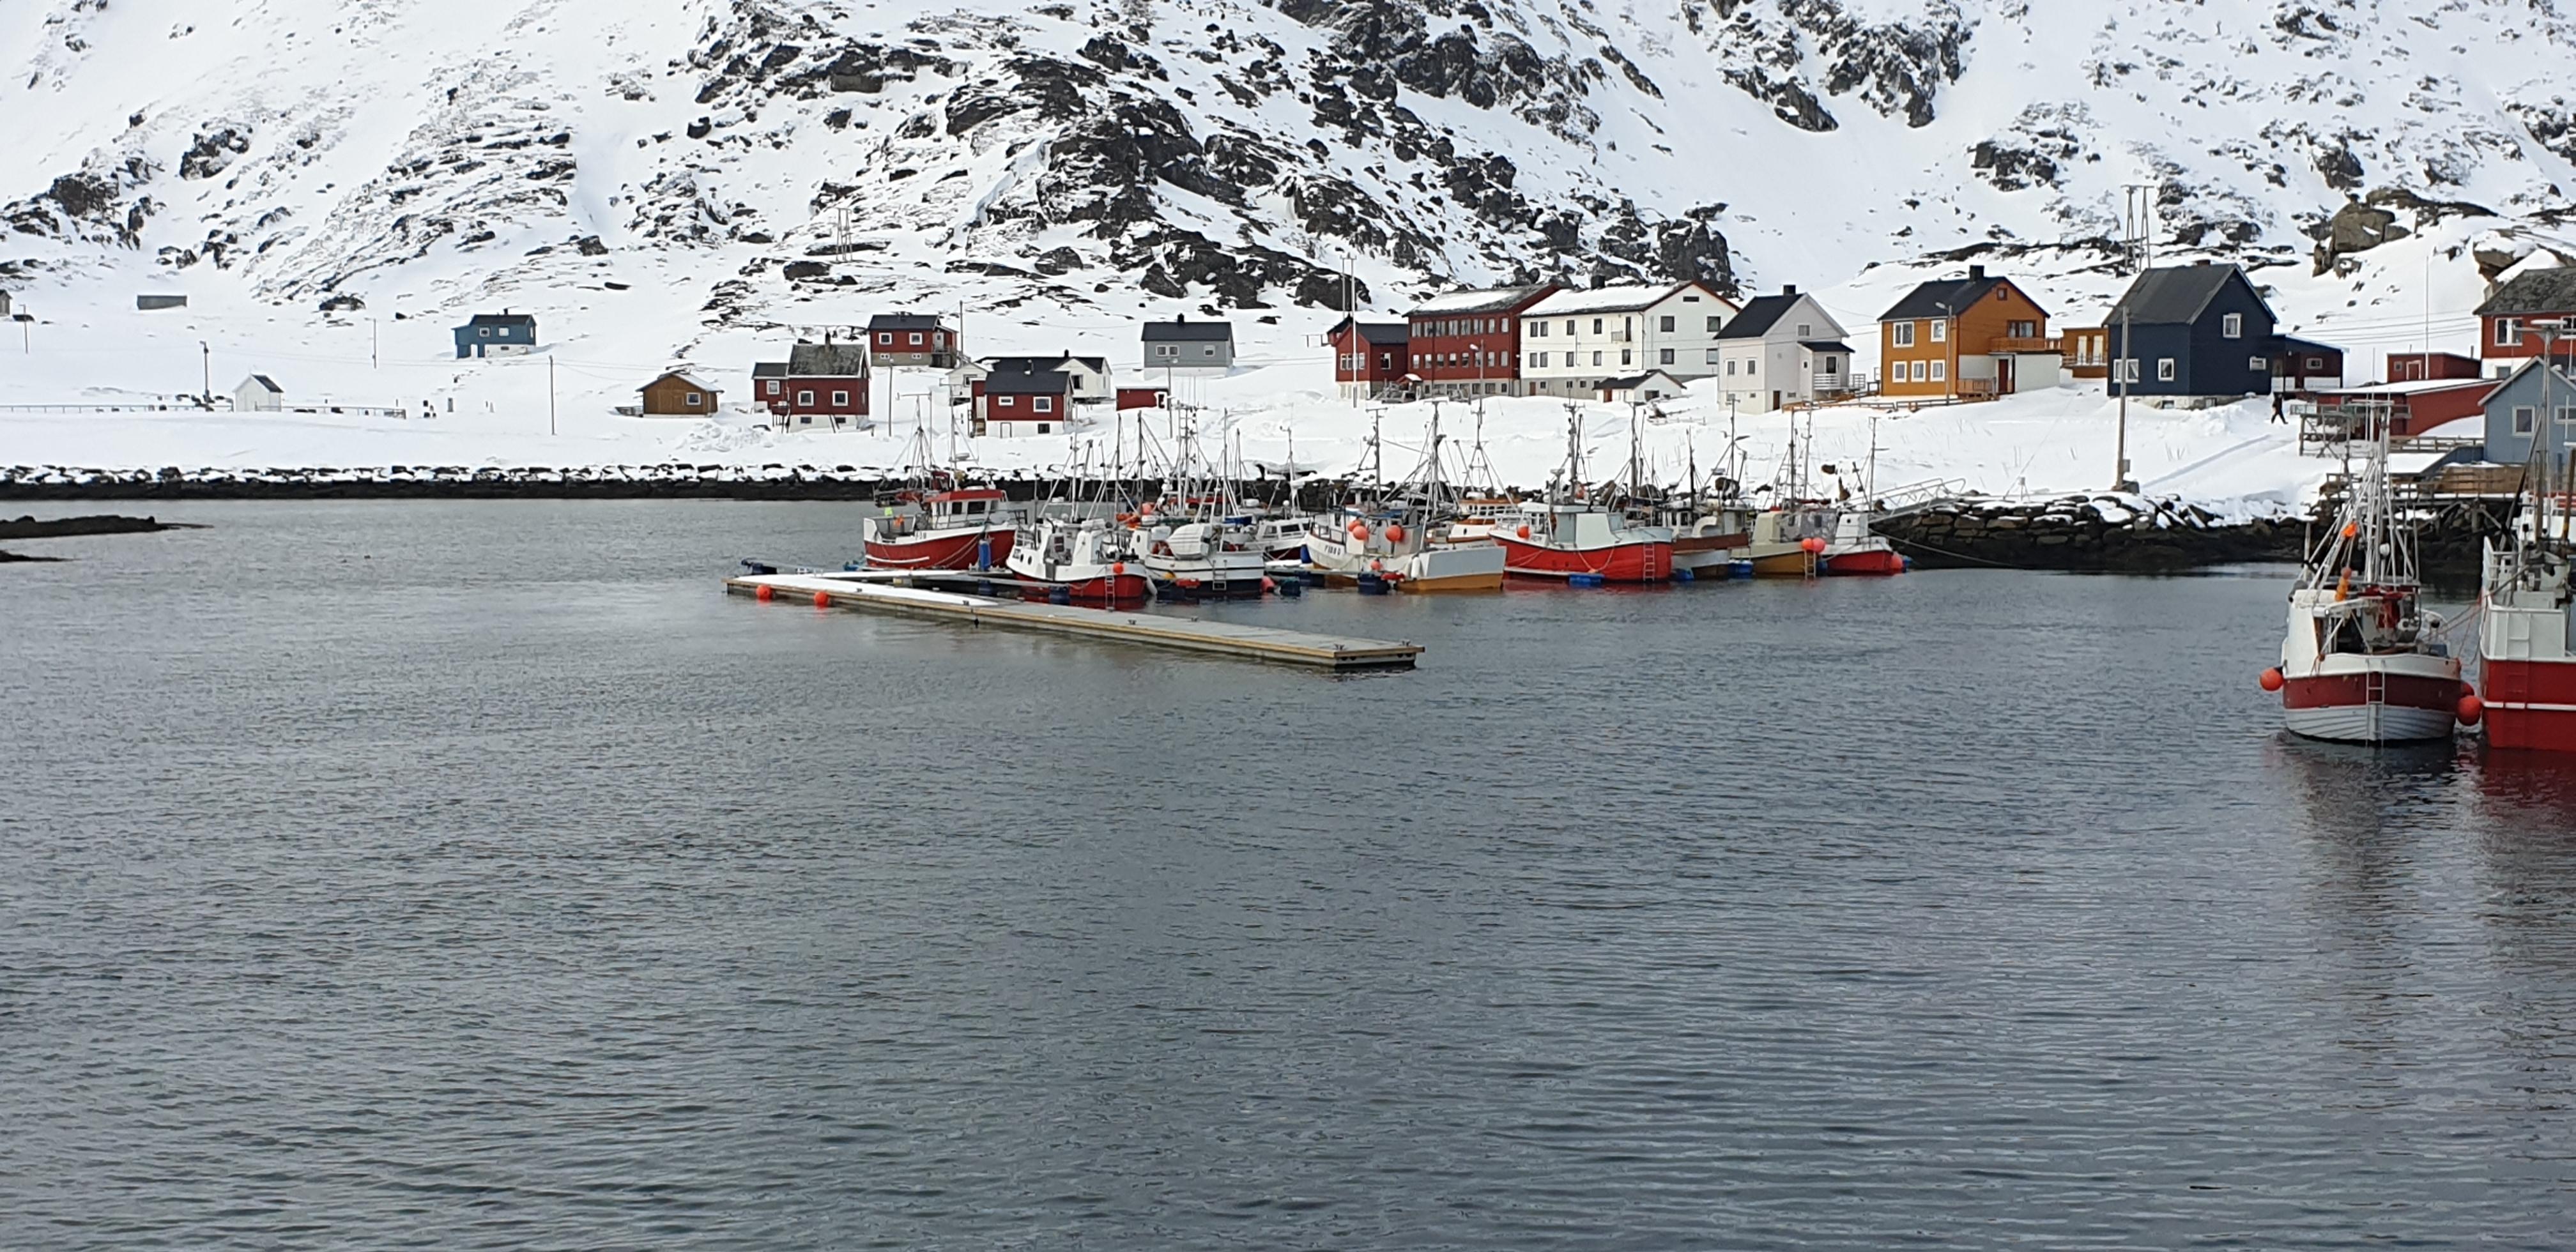 https://marinasolutions.no/uploads/20190402_095548-Ingøya-Foto-Per-Ronny-Vestli.jpg